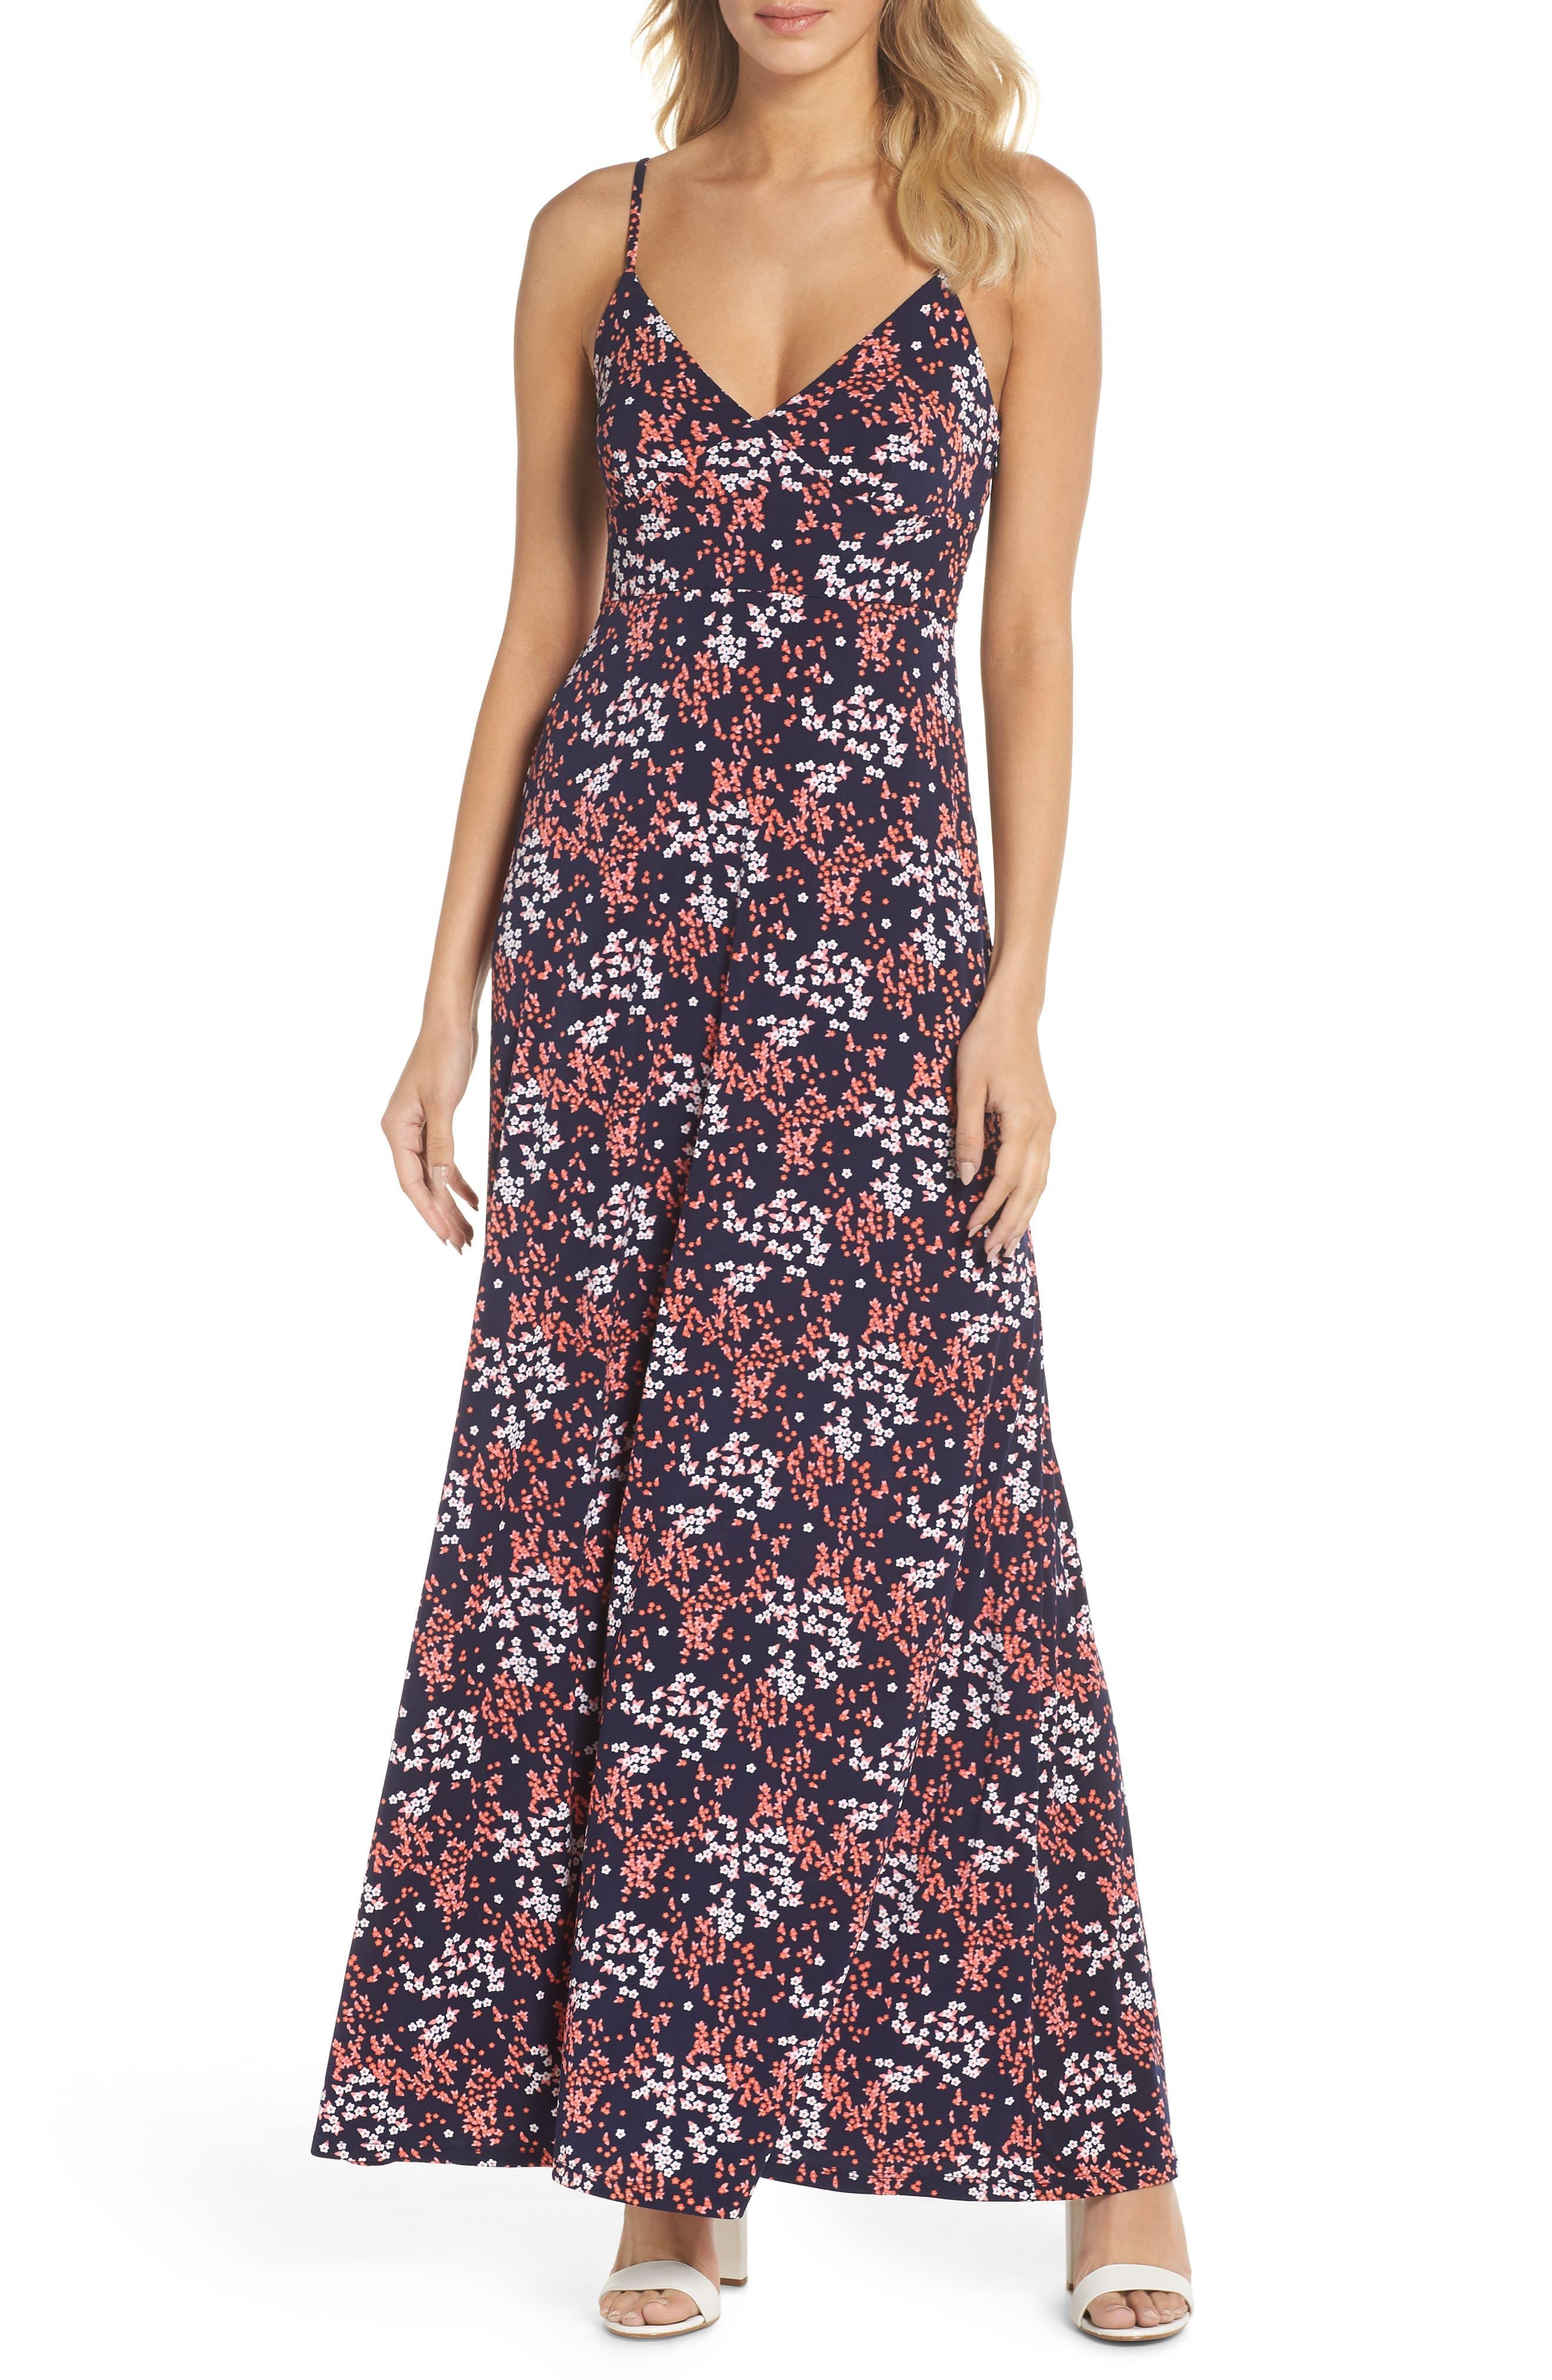 Bloom Maxi Dress,                             Main thumbnail 1, color,